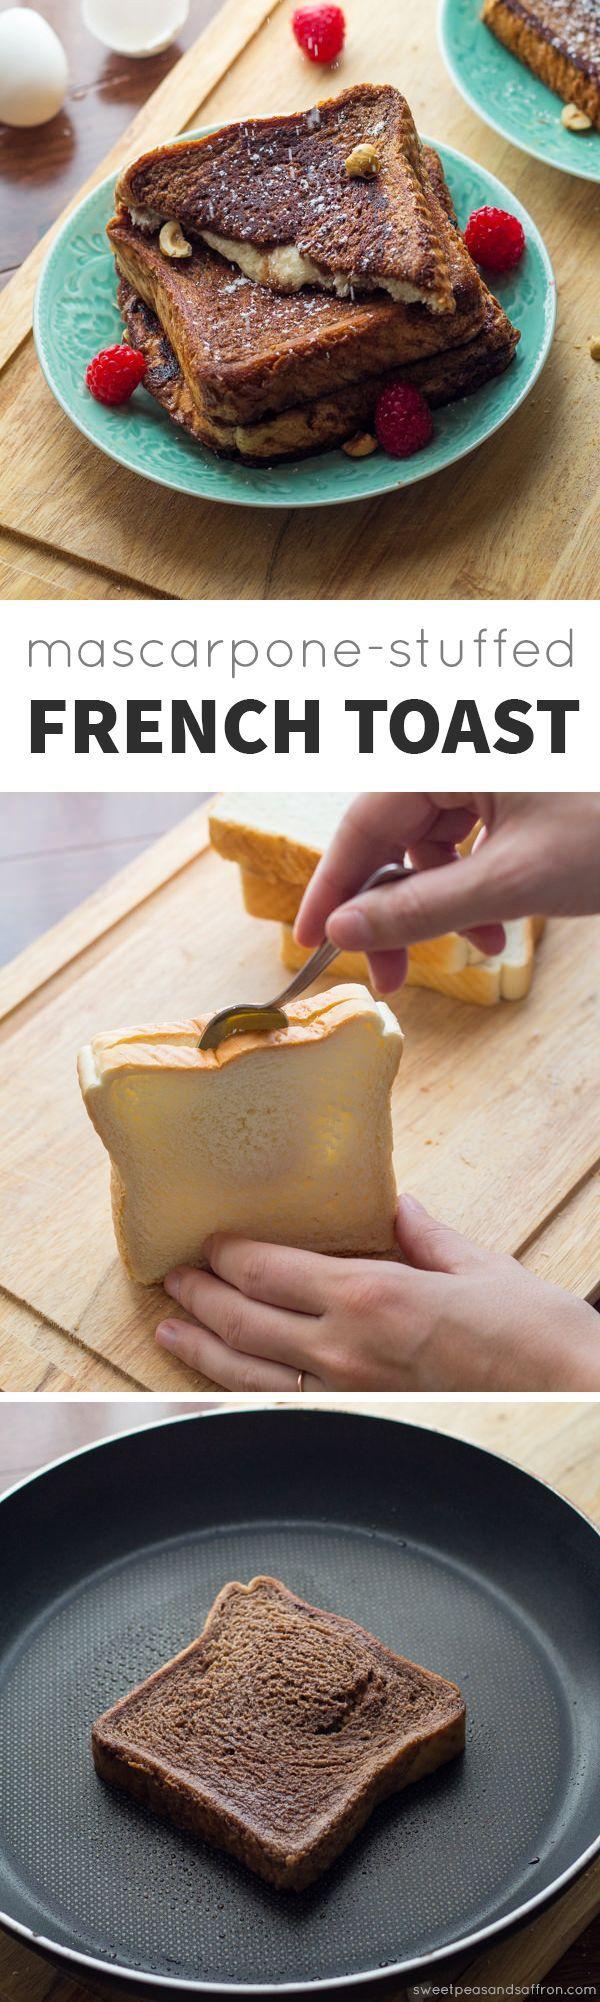 Mascarpone-Stuffed Chocolate Espresso French Toast @sweetpeasaffron